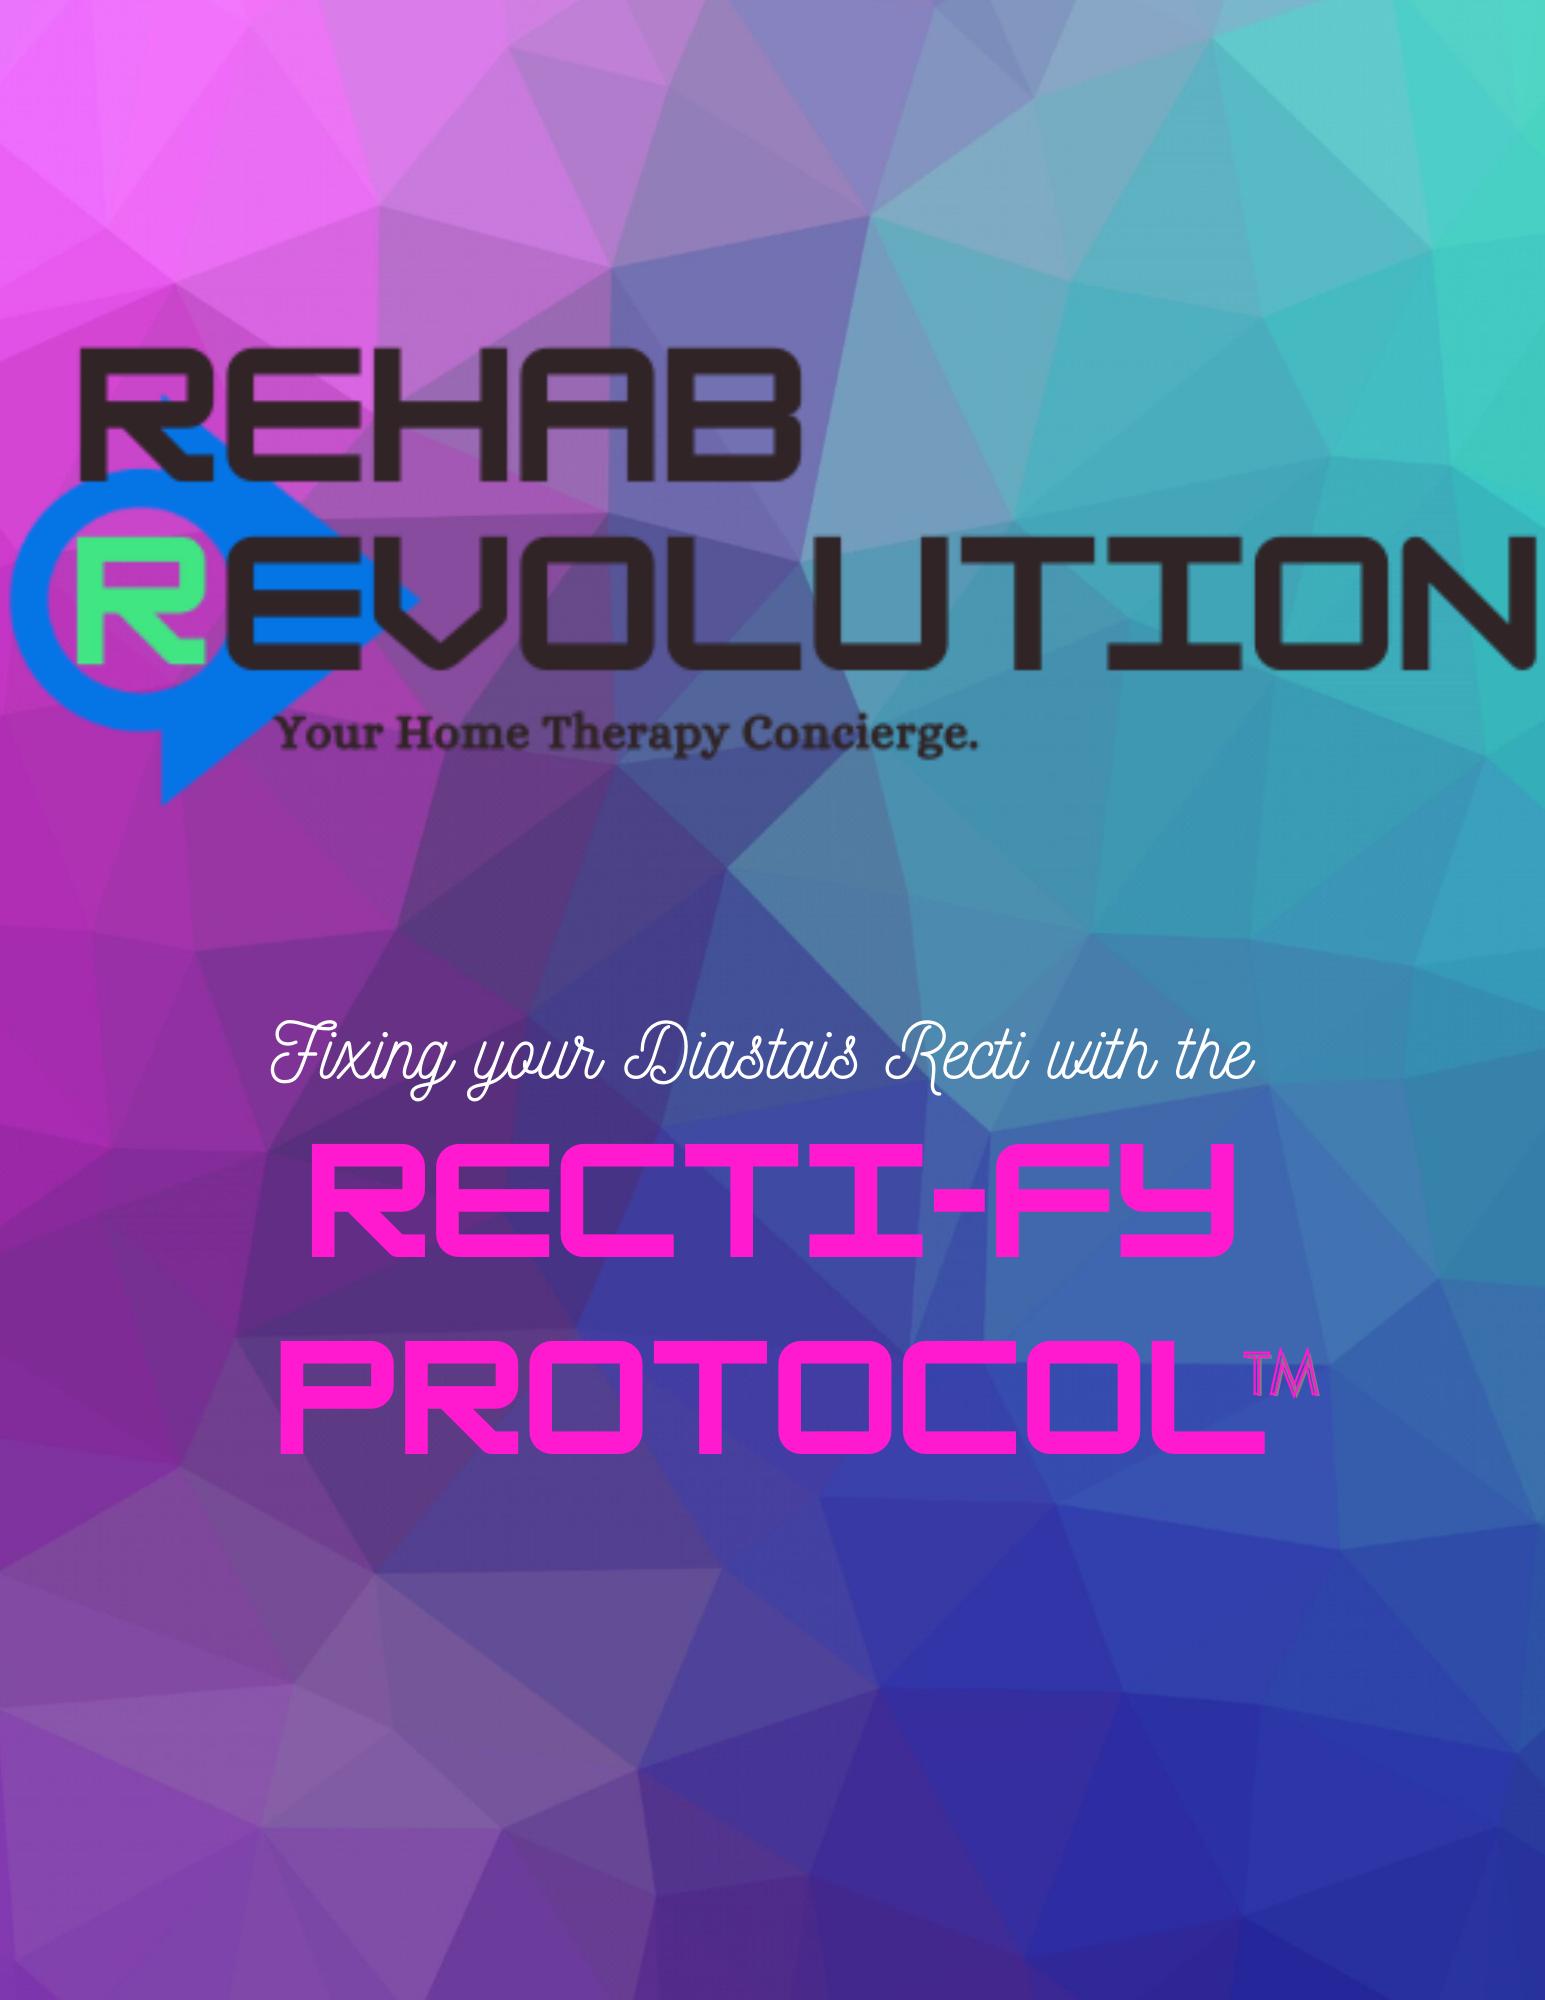 Rehab-Revolution-RECTIFY-Protocol